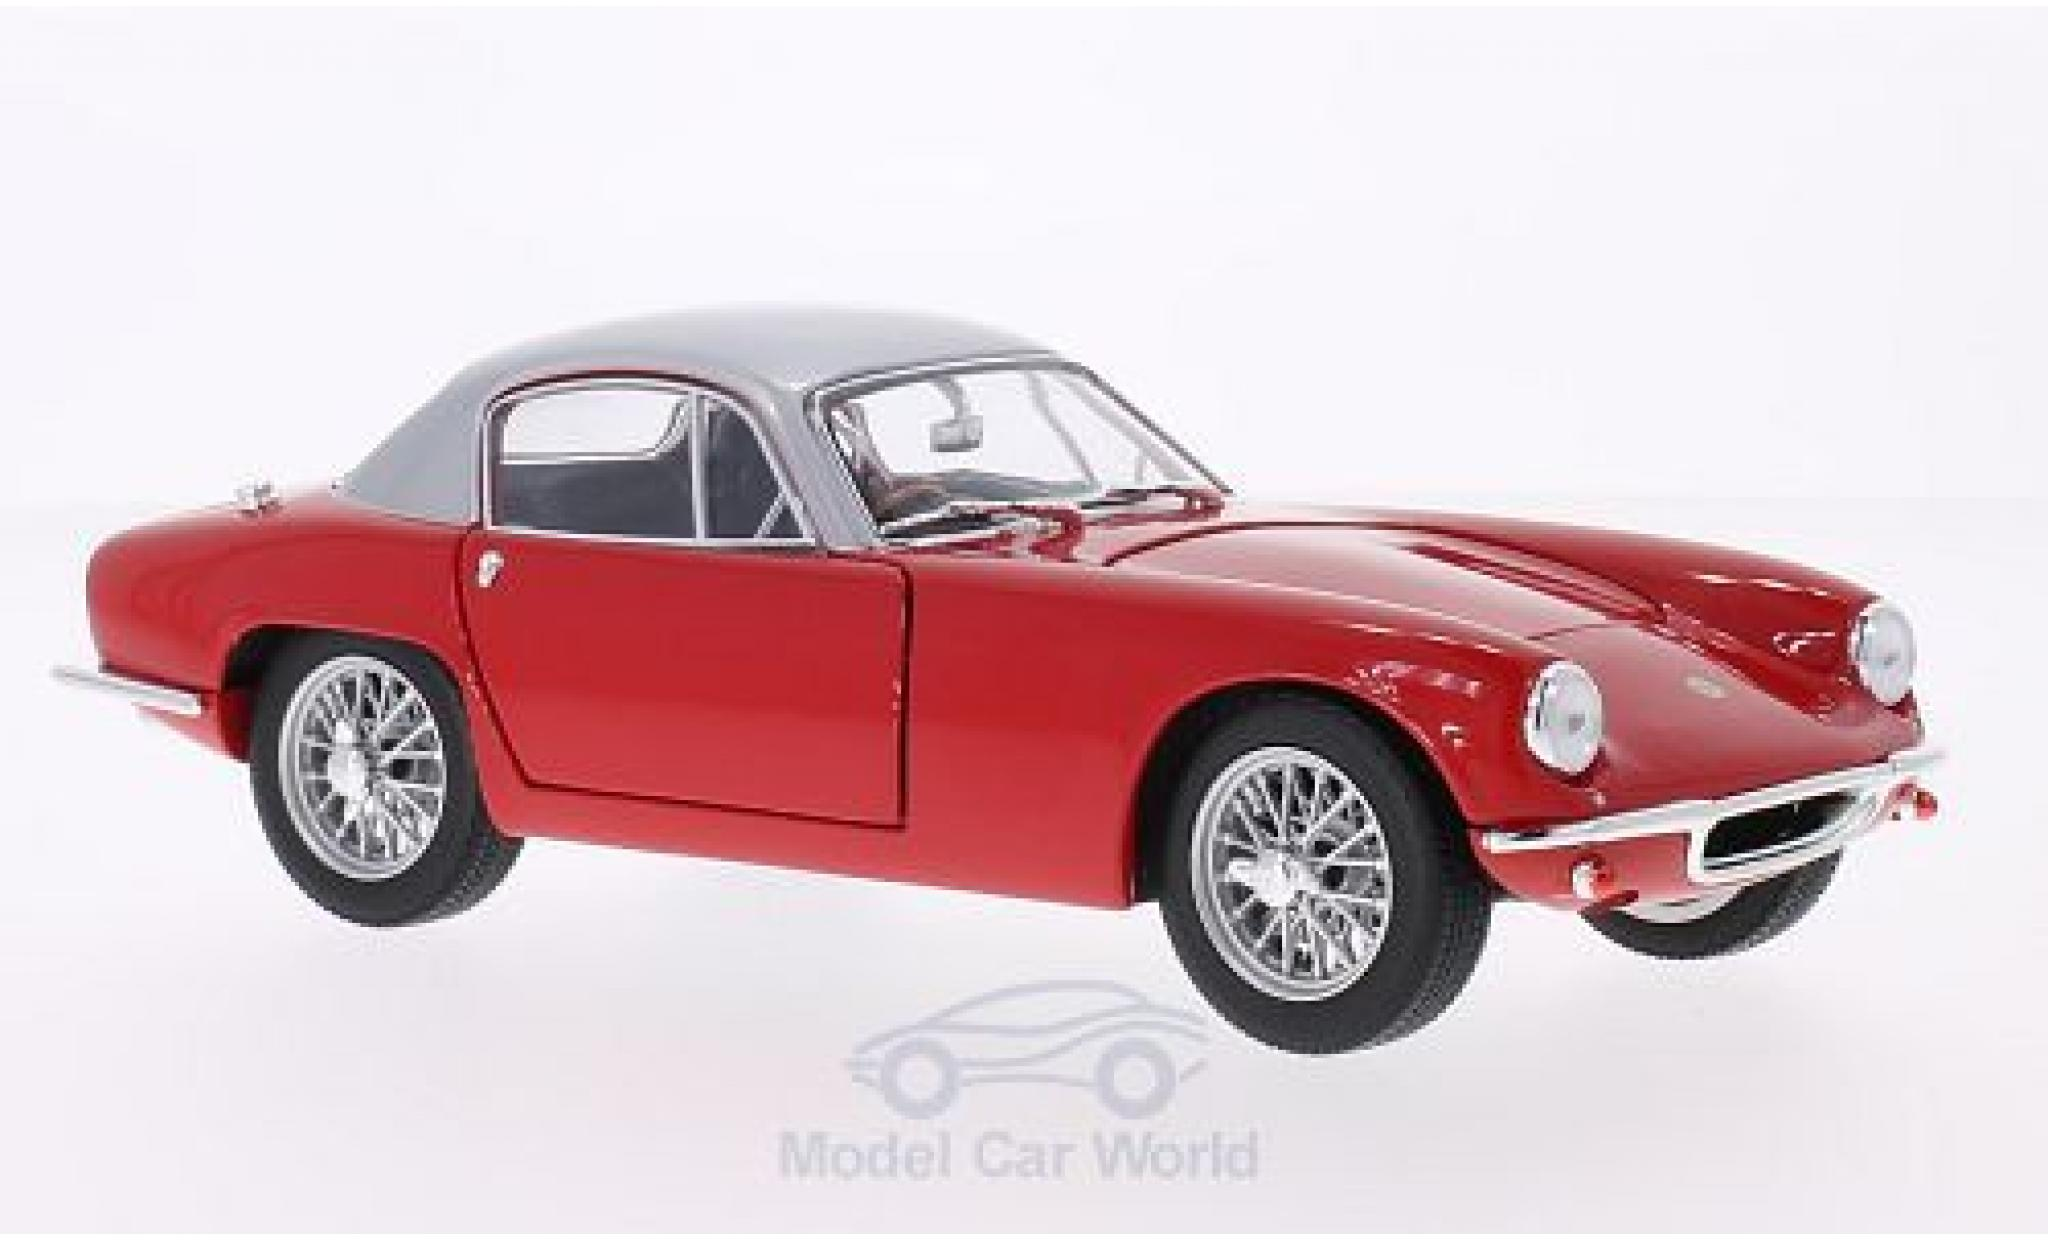 Lotus Elite 1/18 WhiteBox red/grey RHD 1960